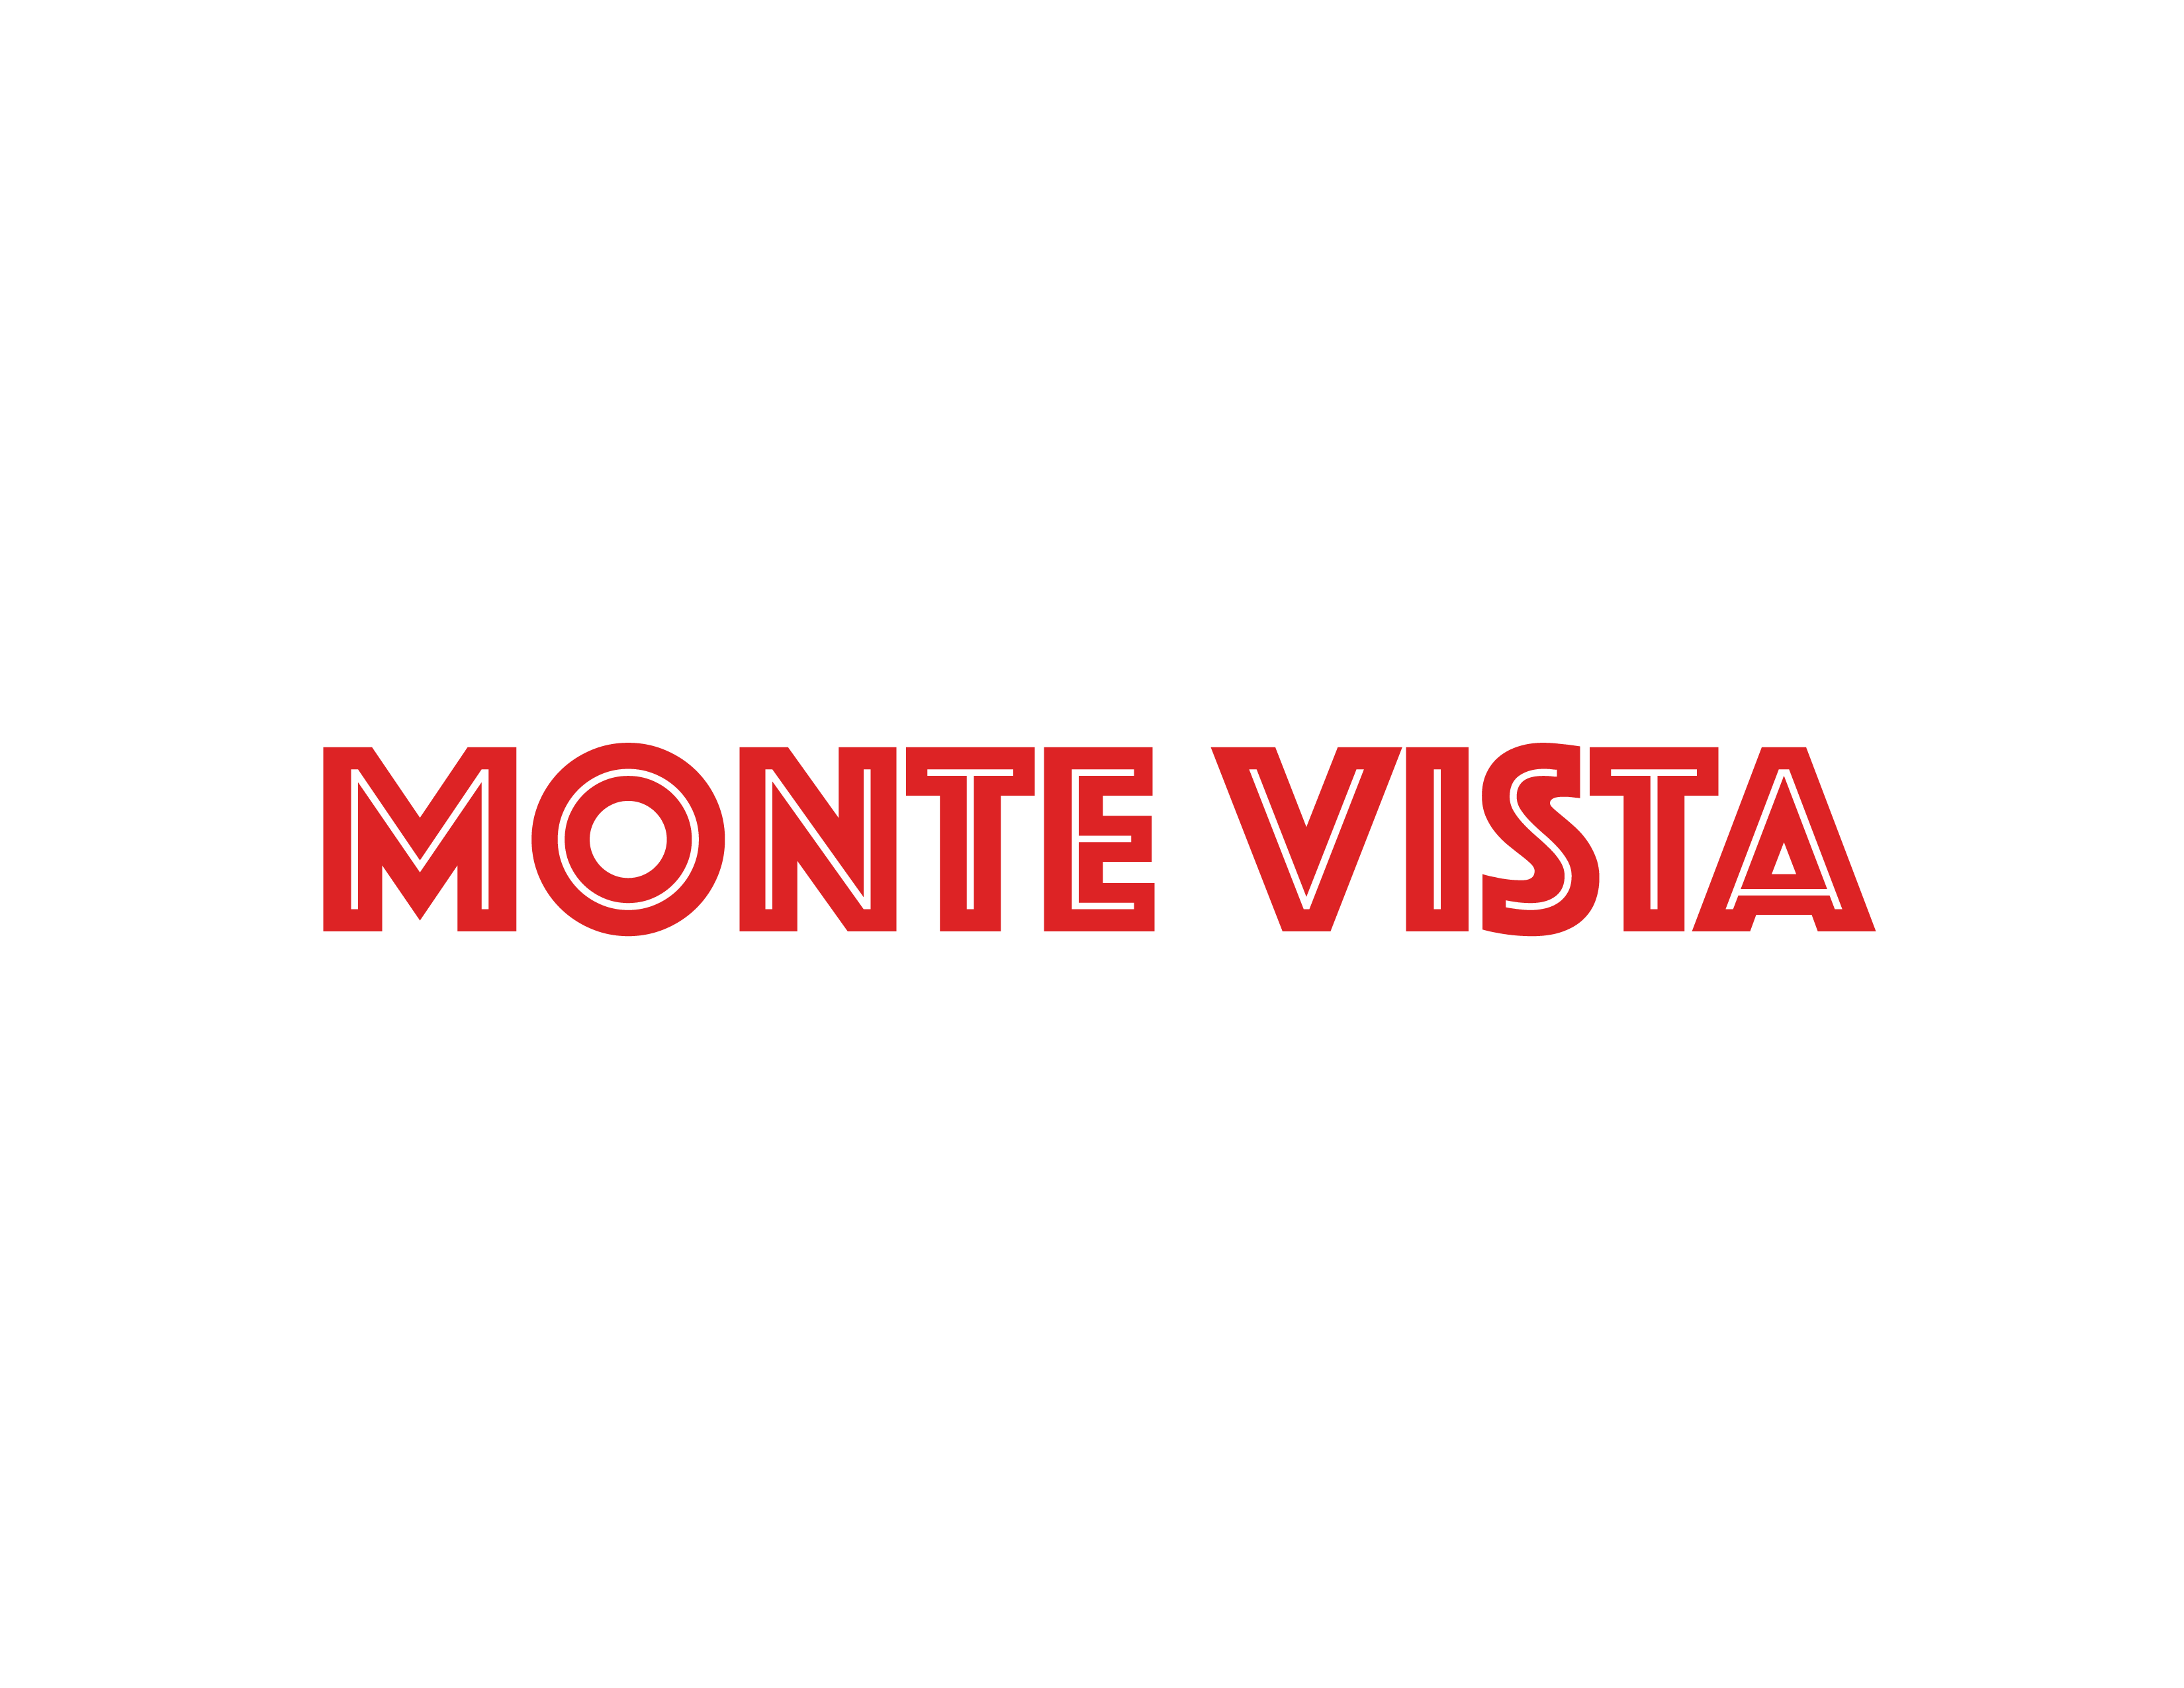 brandpad_template_hotel_monte_vista_transparent-01